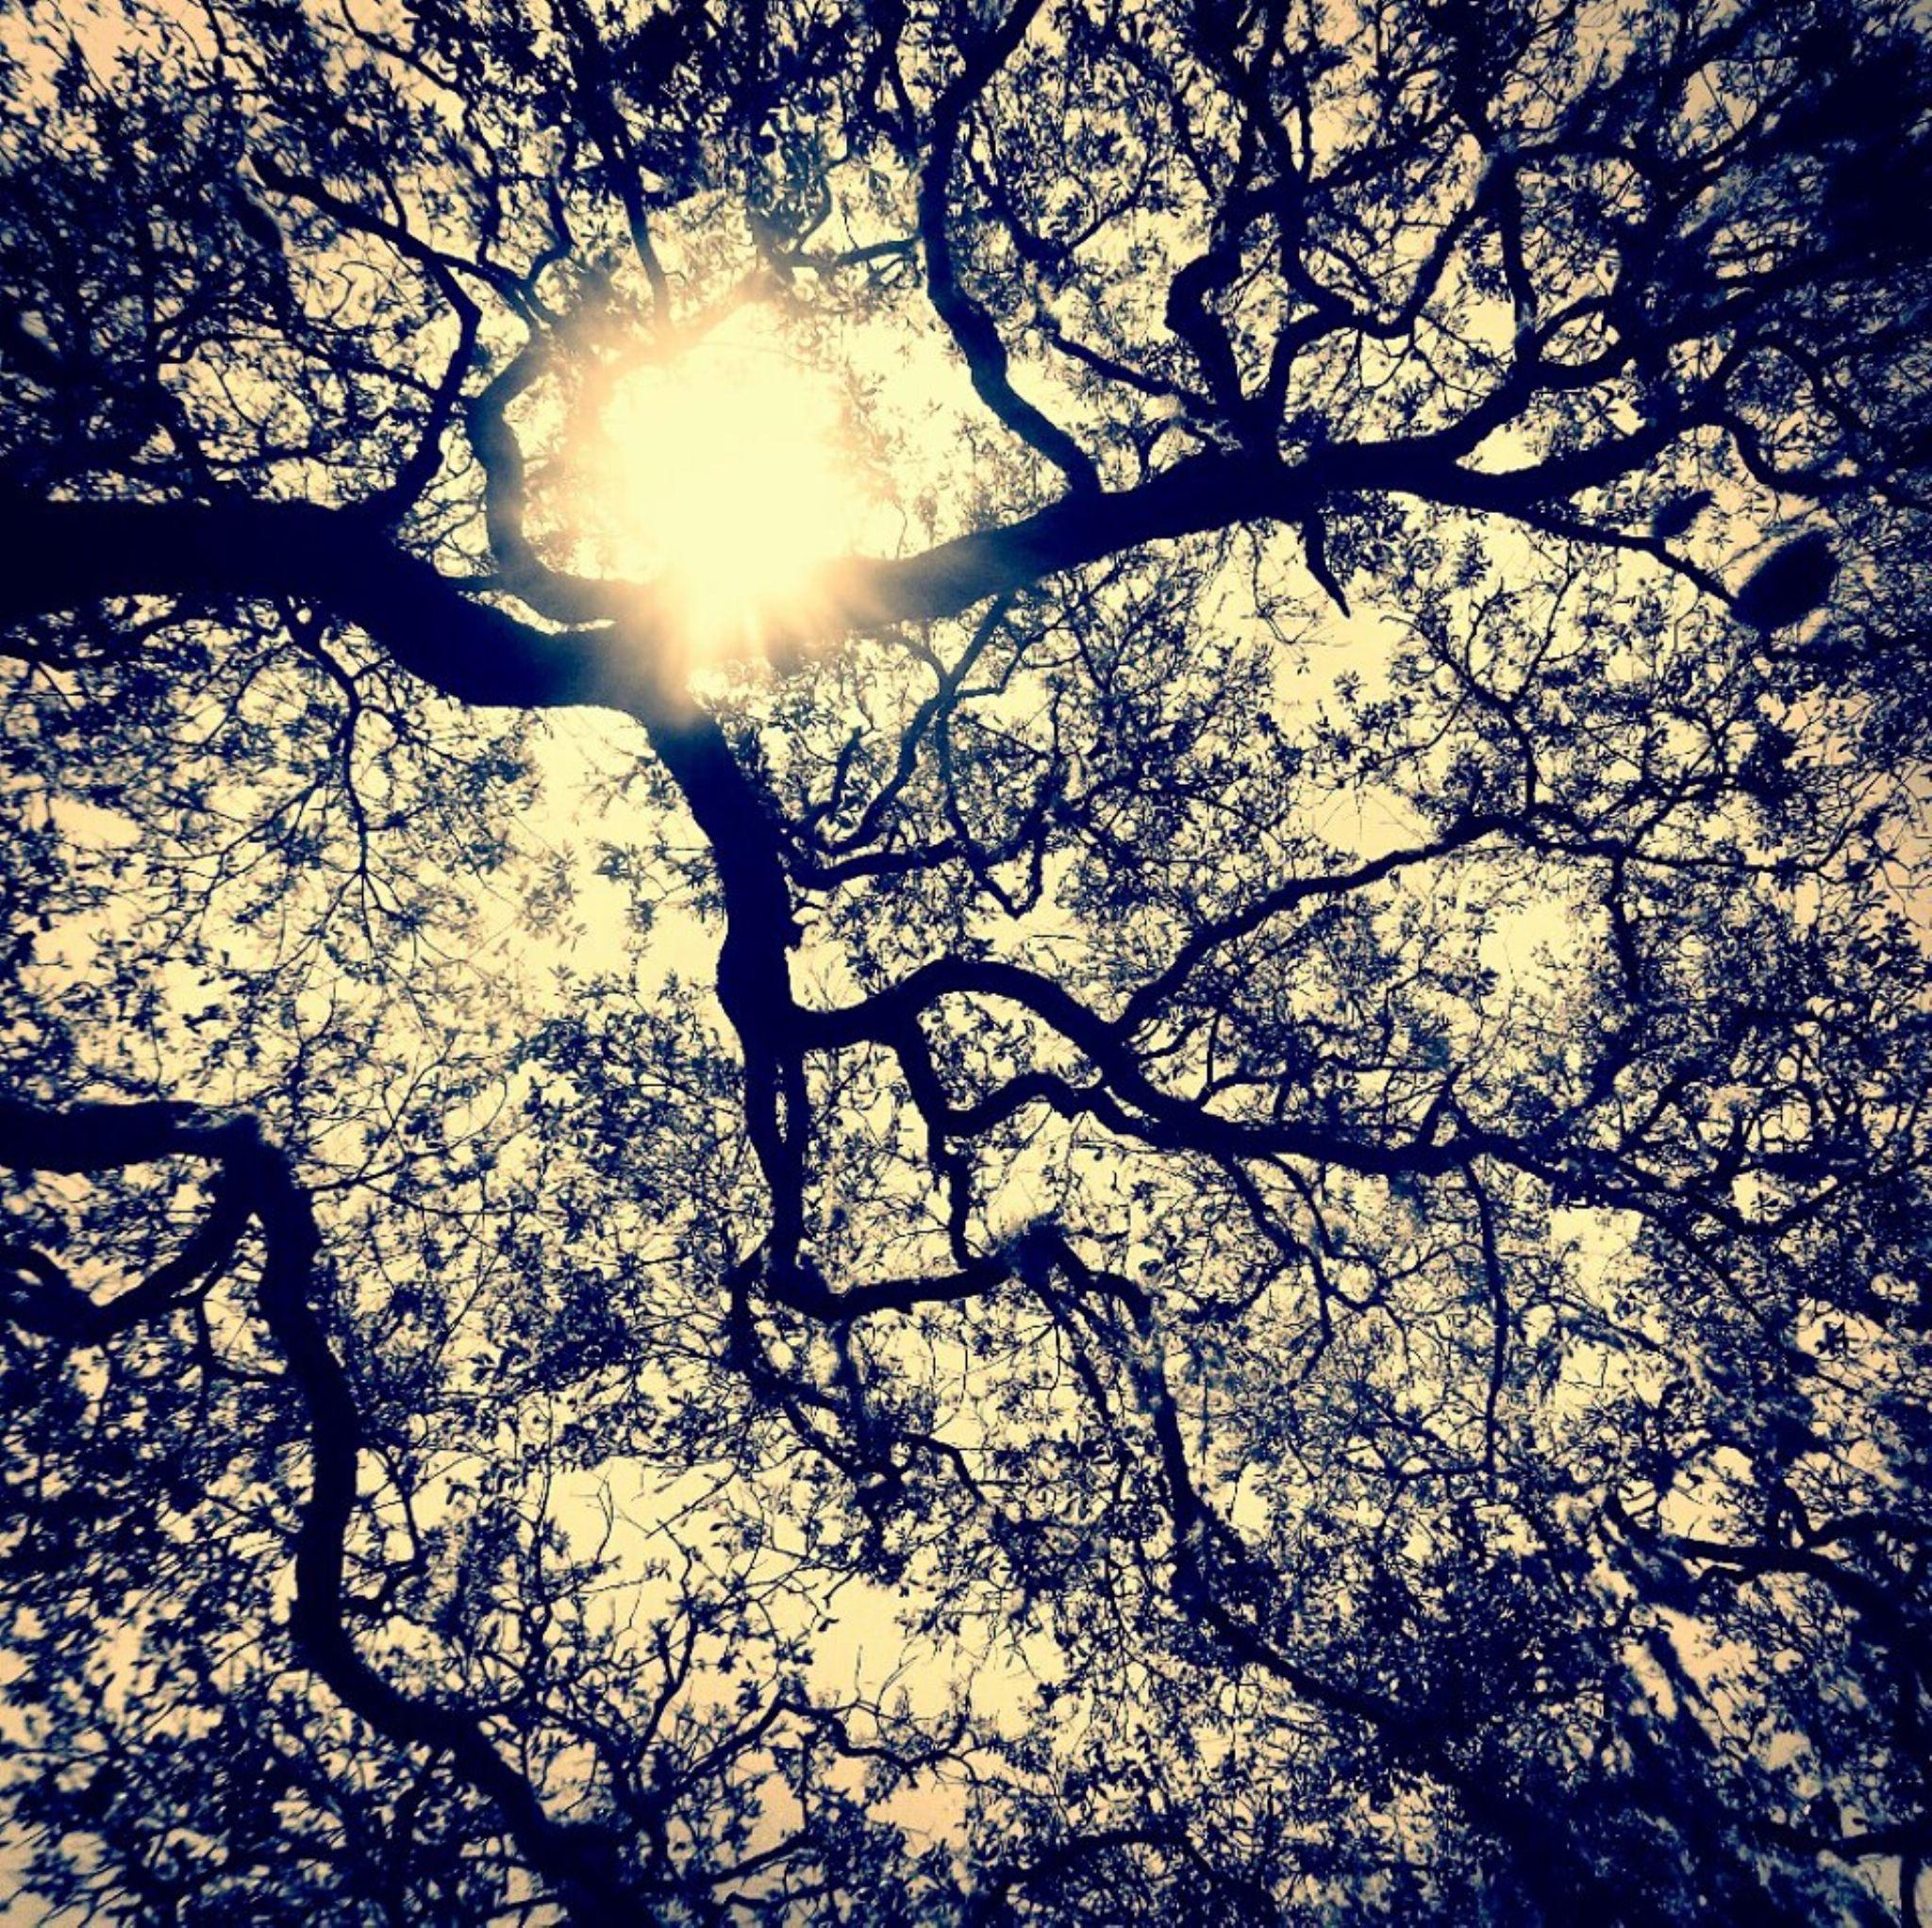 Trees 2 by Chelsey Elizabeth